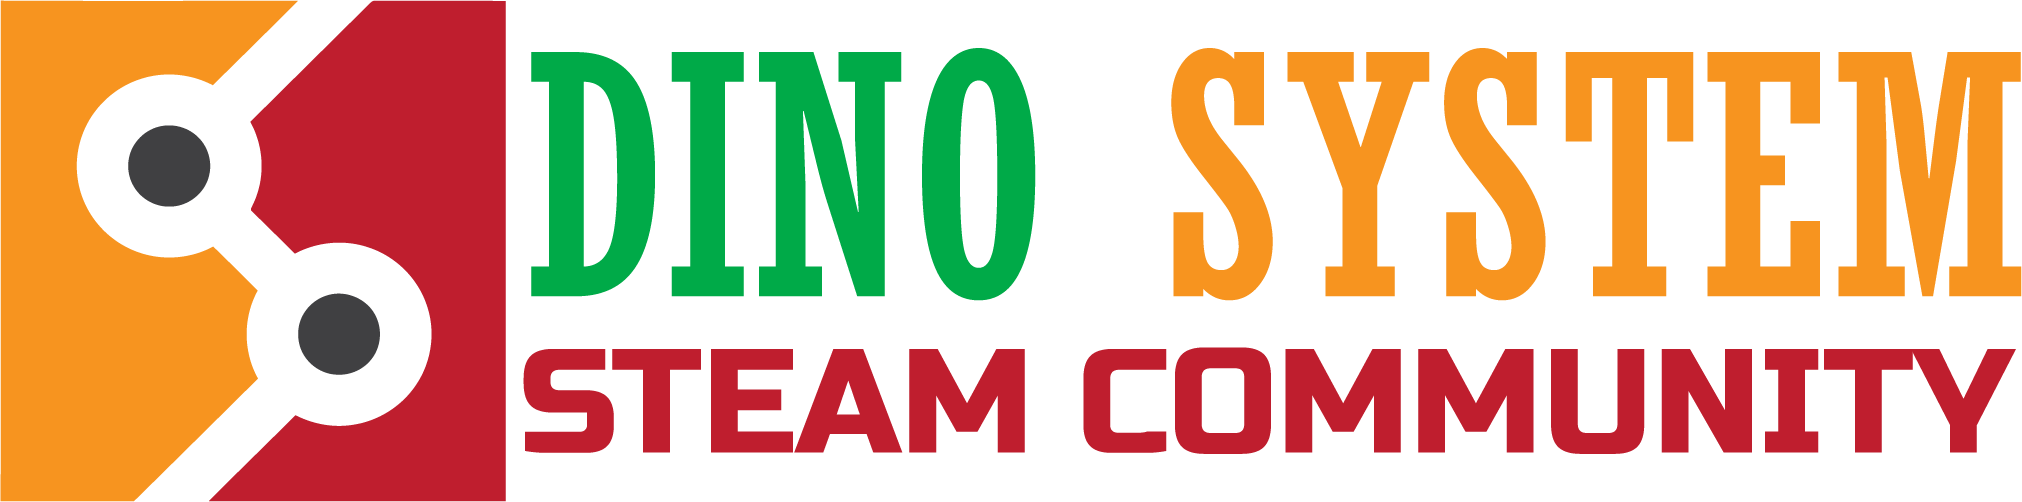 Dino System